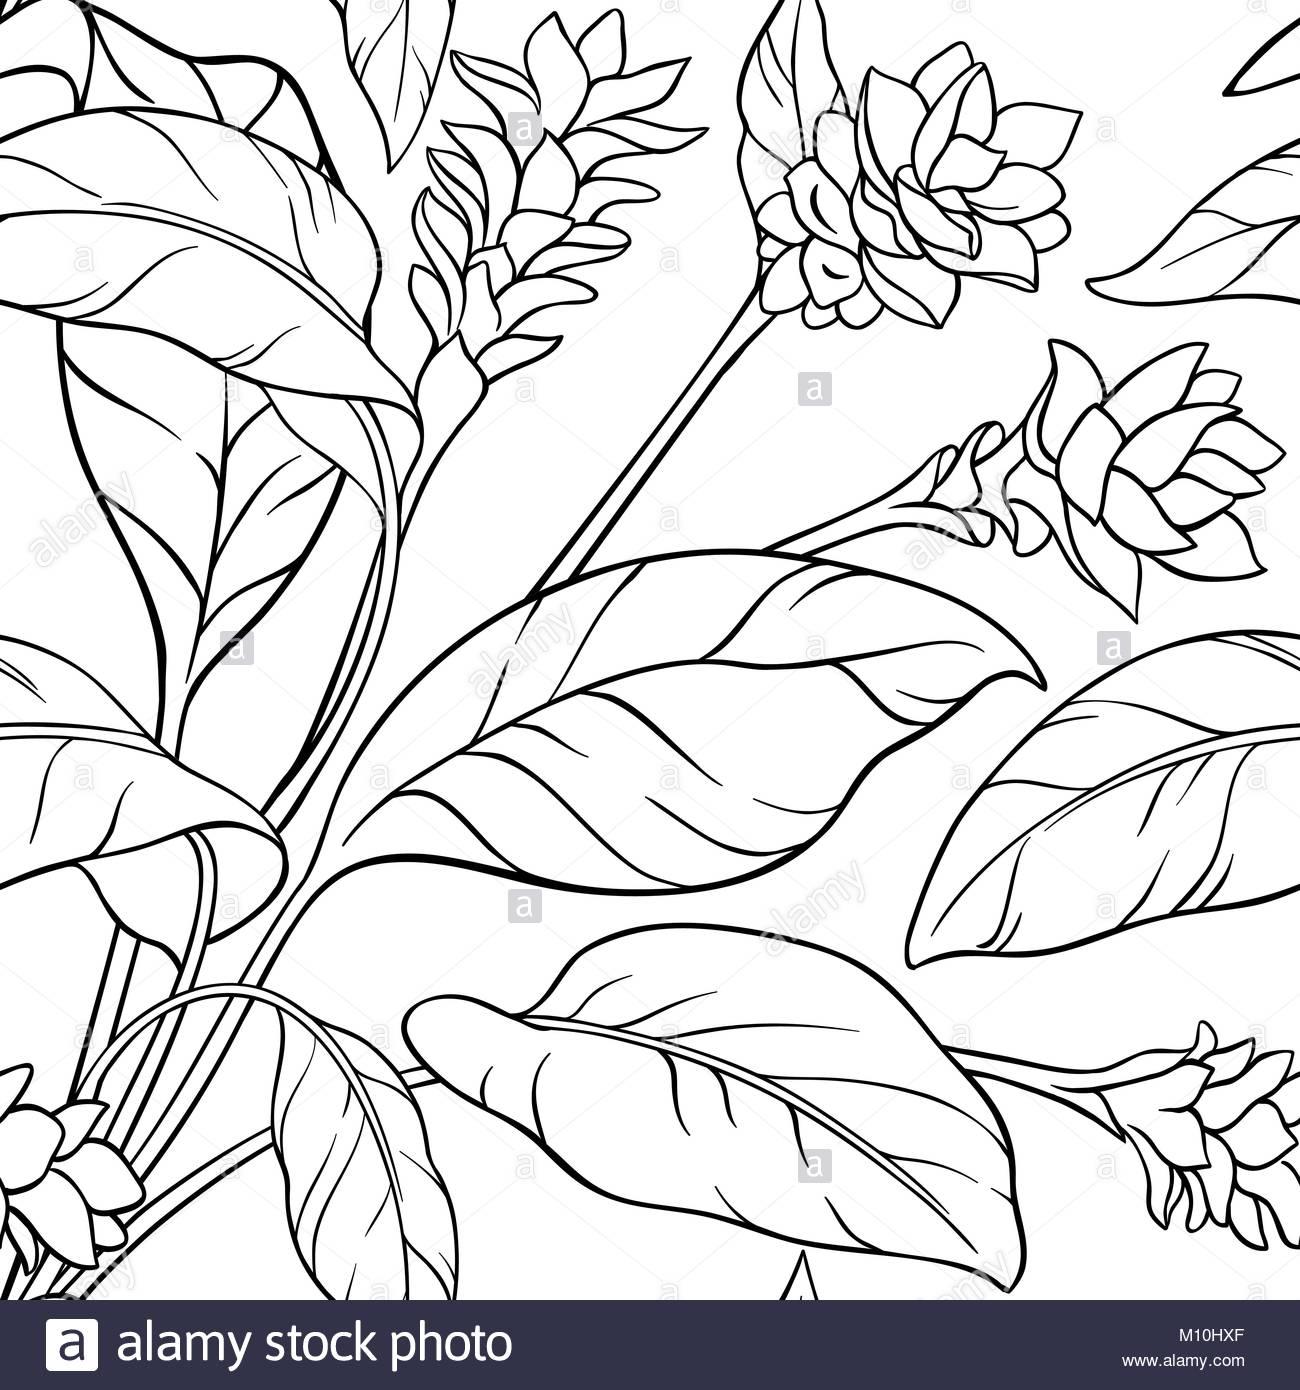 1300x1390 Turmeric Plant Illustration Stock Photos Amp Turmeric Plant